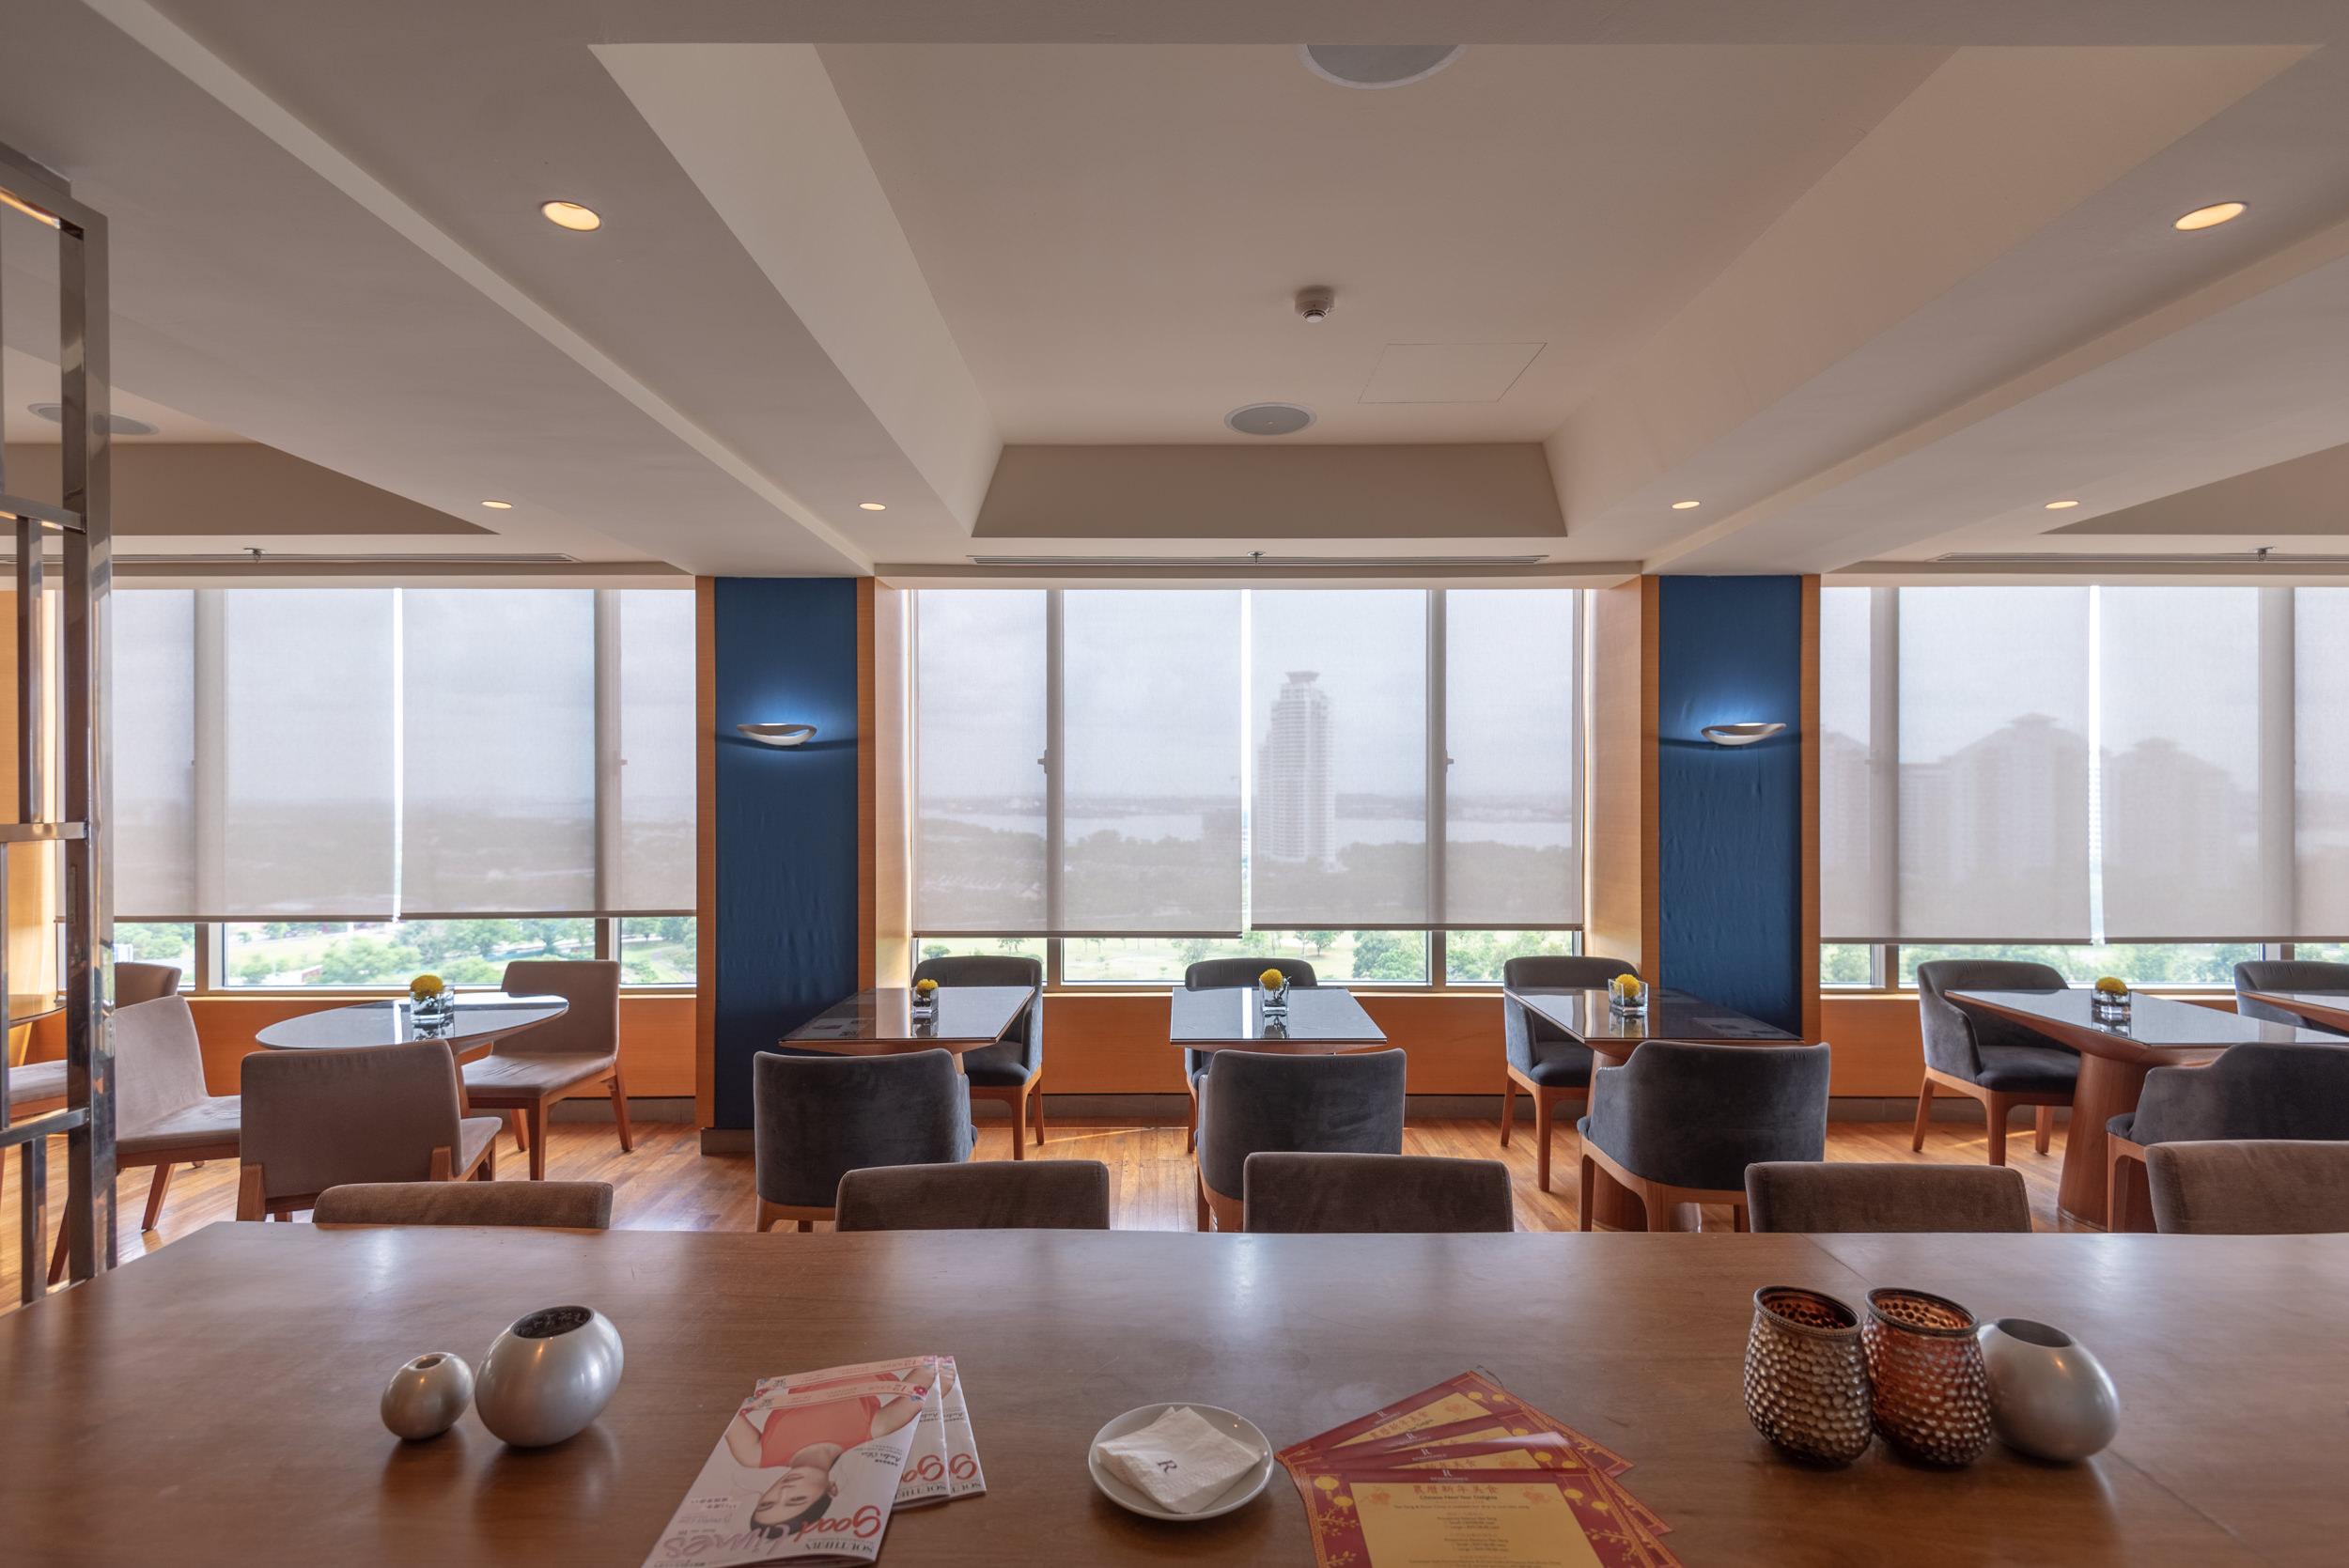 Interiors  Club Lounge - Renaissance Johor Bahru Hotel